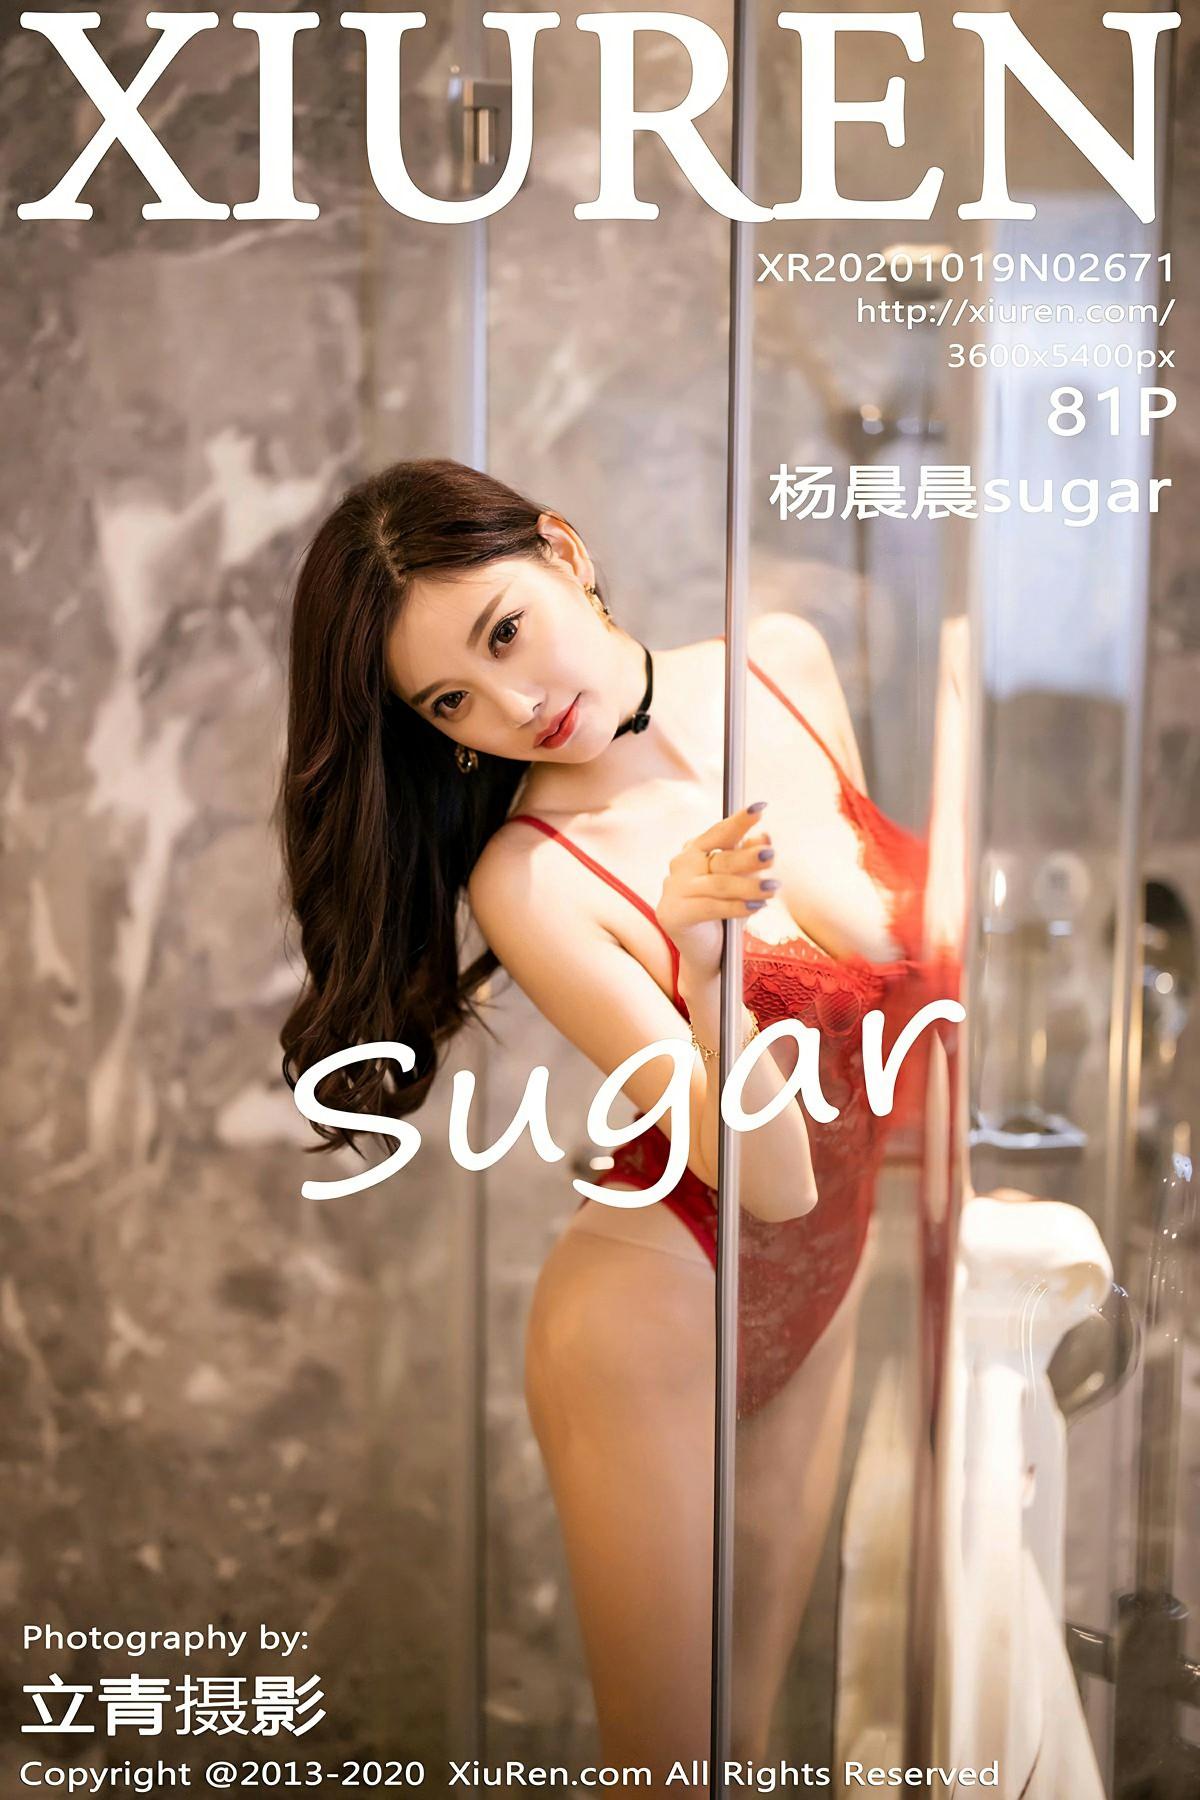 [XiuRen秀人网] 2020.10.19 No.2671 杨晨晨sugar 第1张